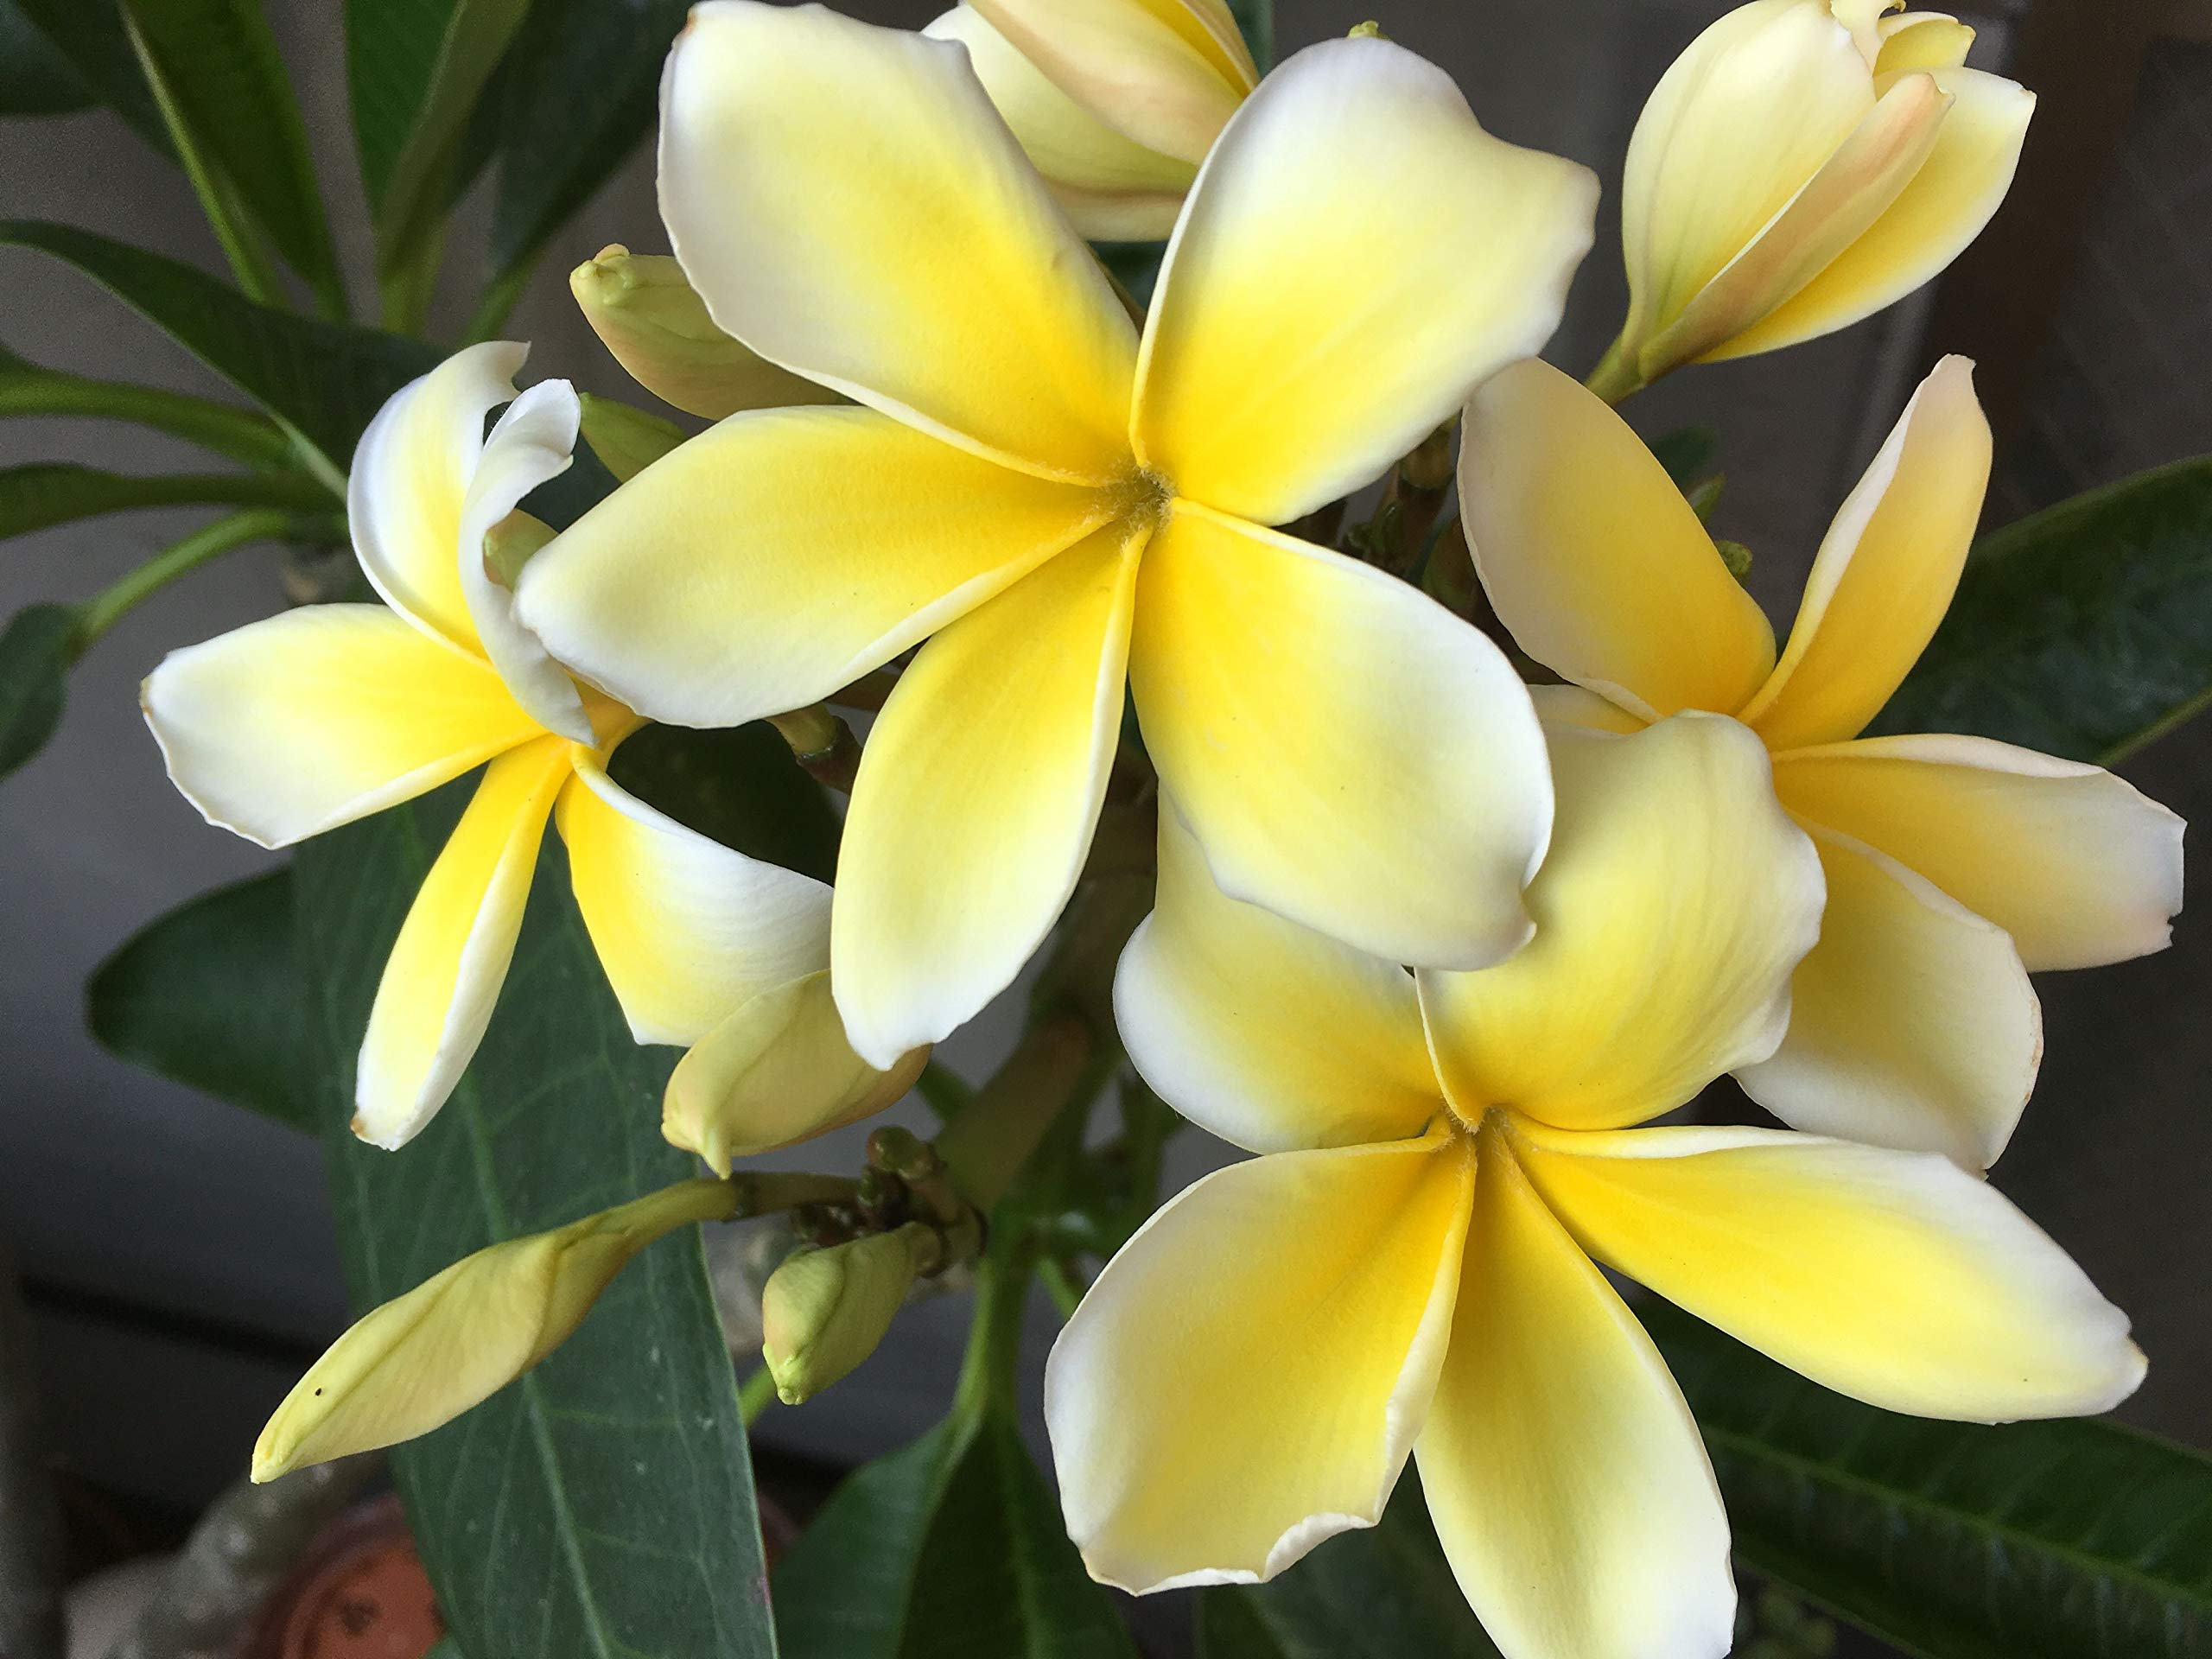 2Pk Live Plant Cutting Tropical Yellow Plumeria A6